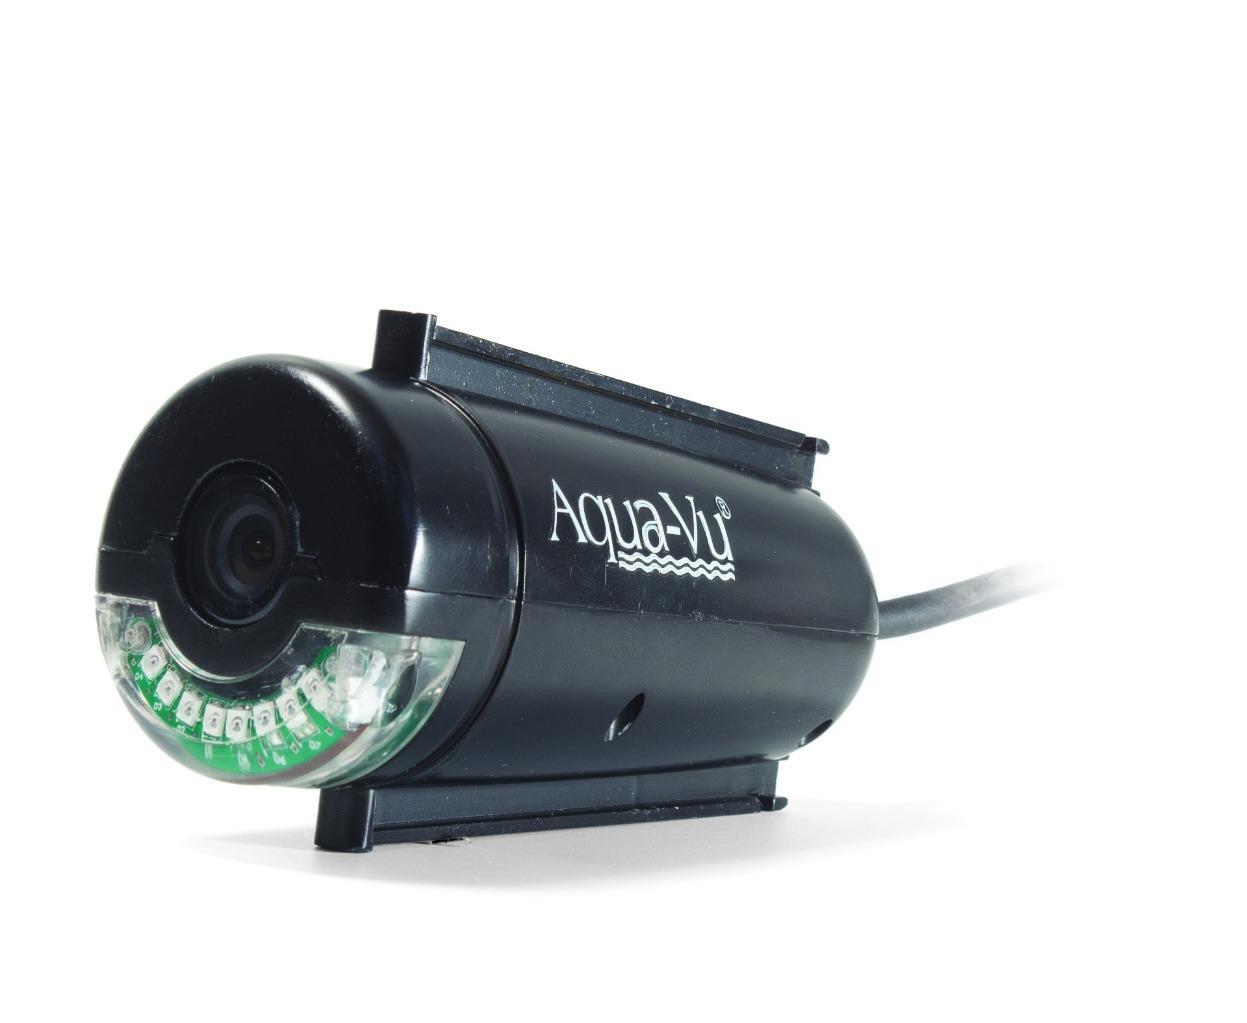 Aqua vu 760czi underwater fishing camera 7 color lcd for Best underwater fishing camera